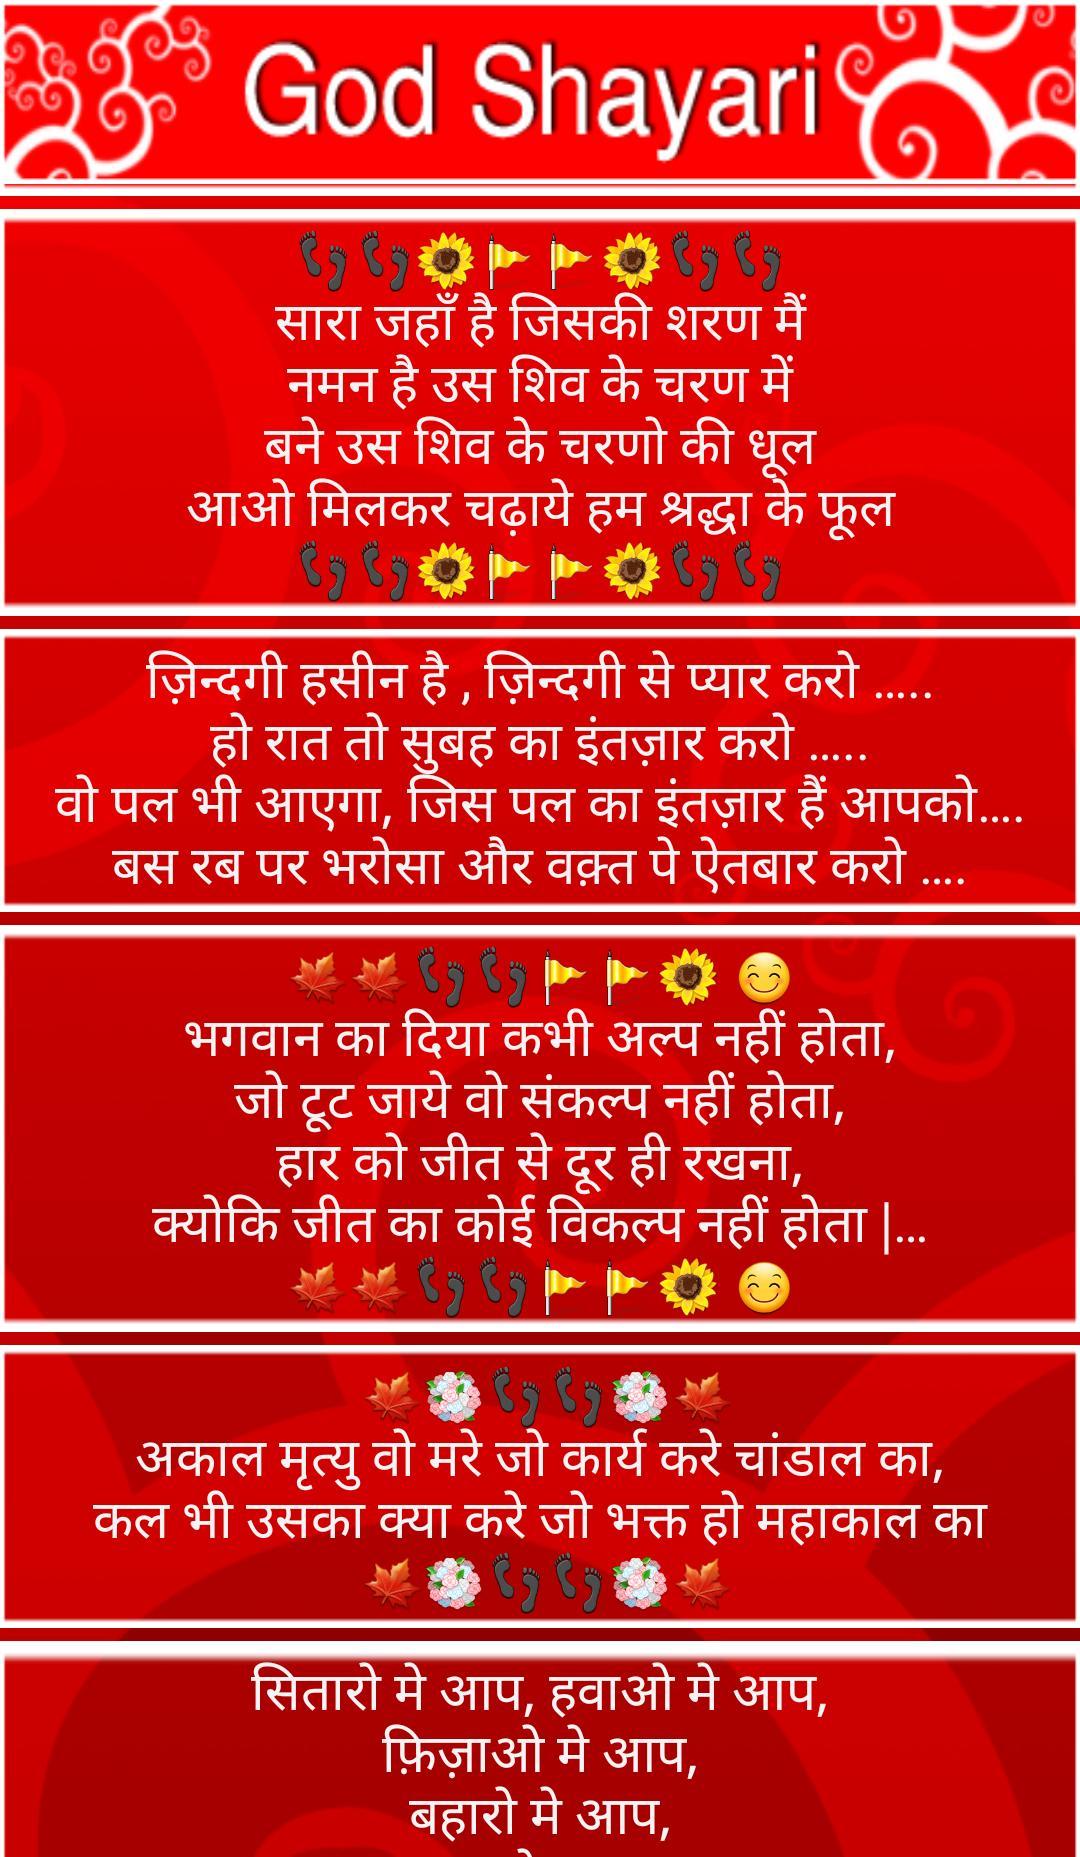 God Shayari for Android - APK Download